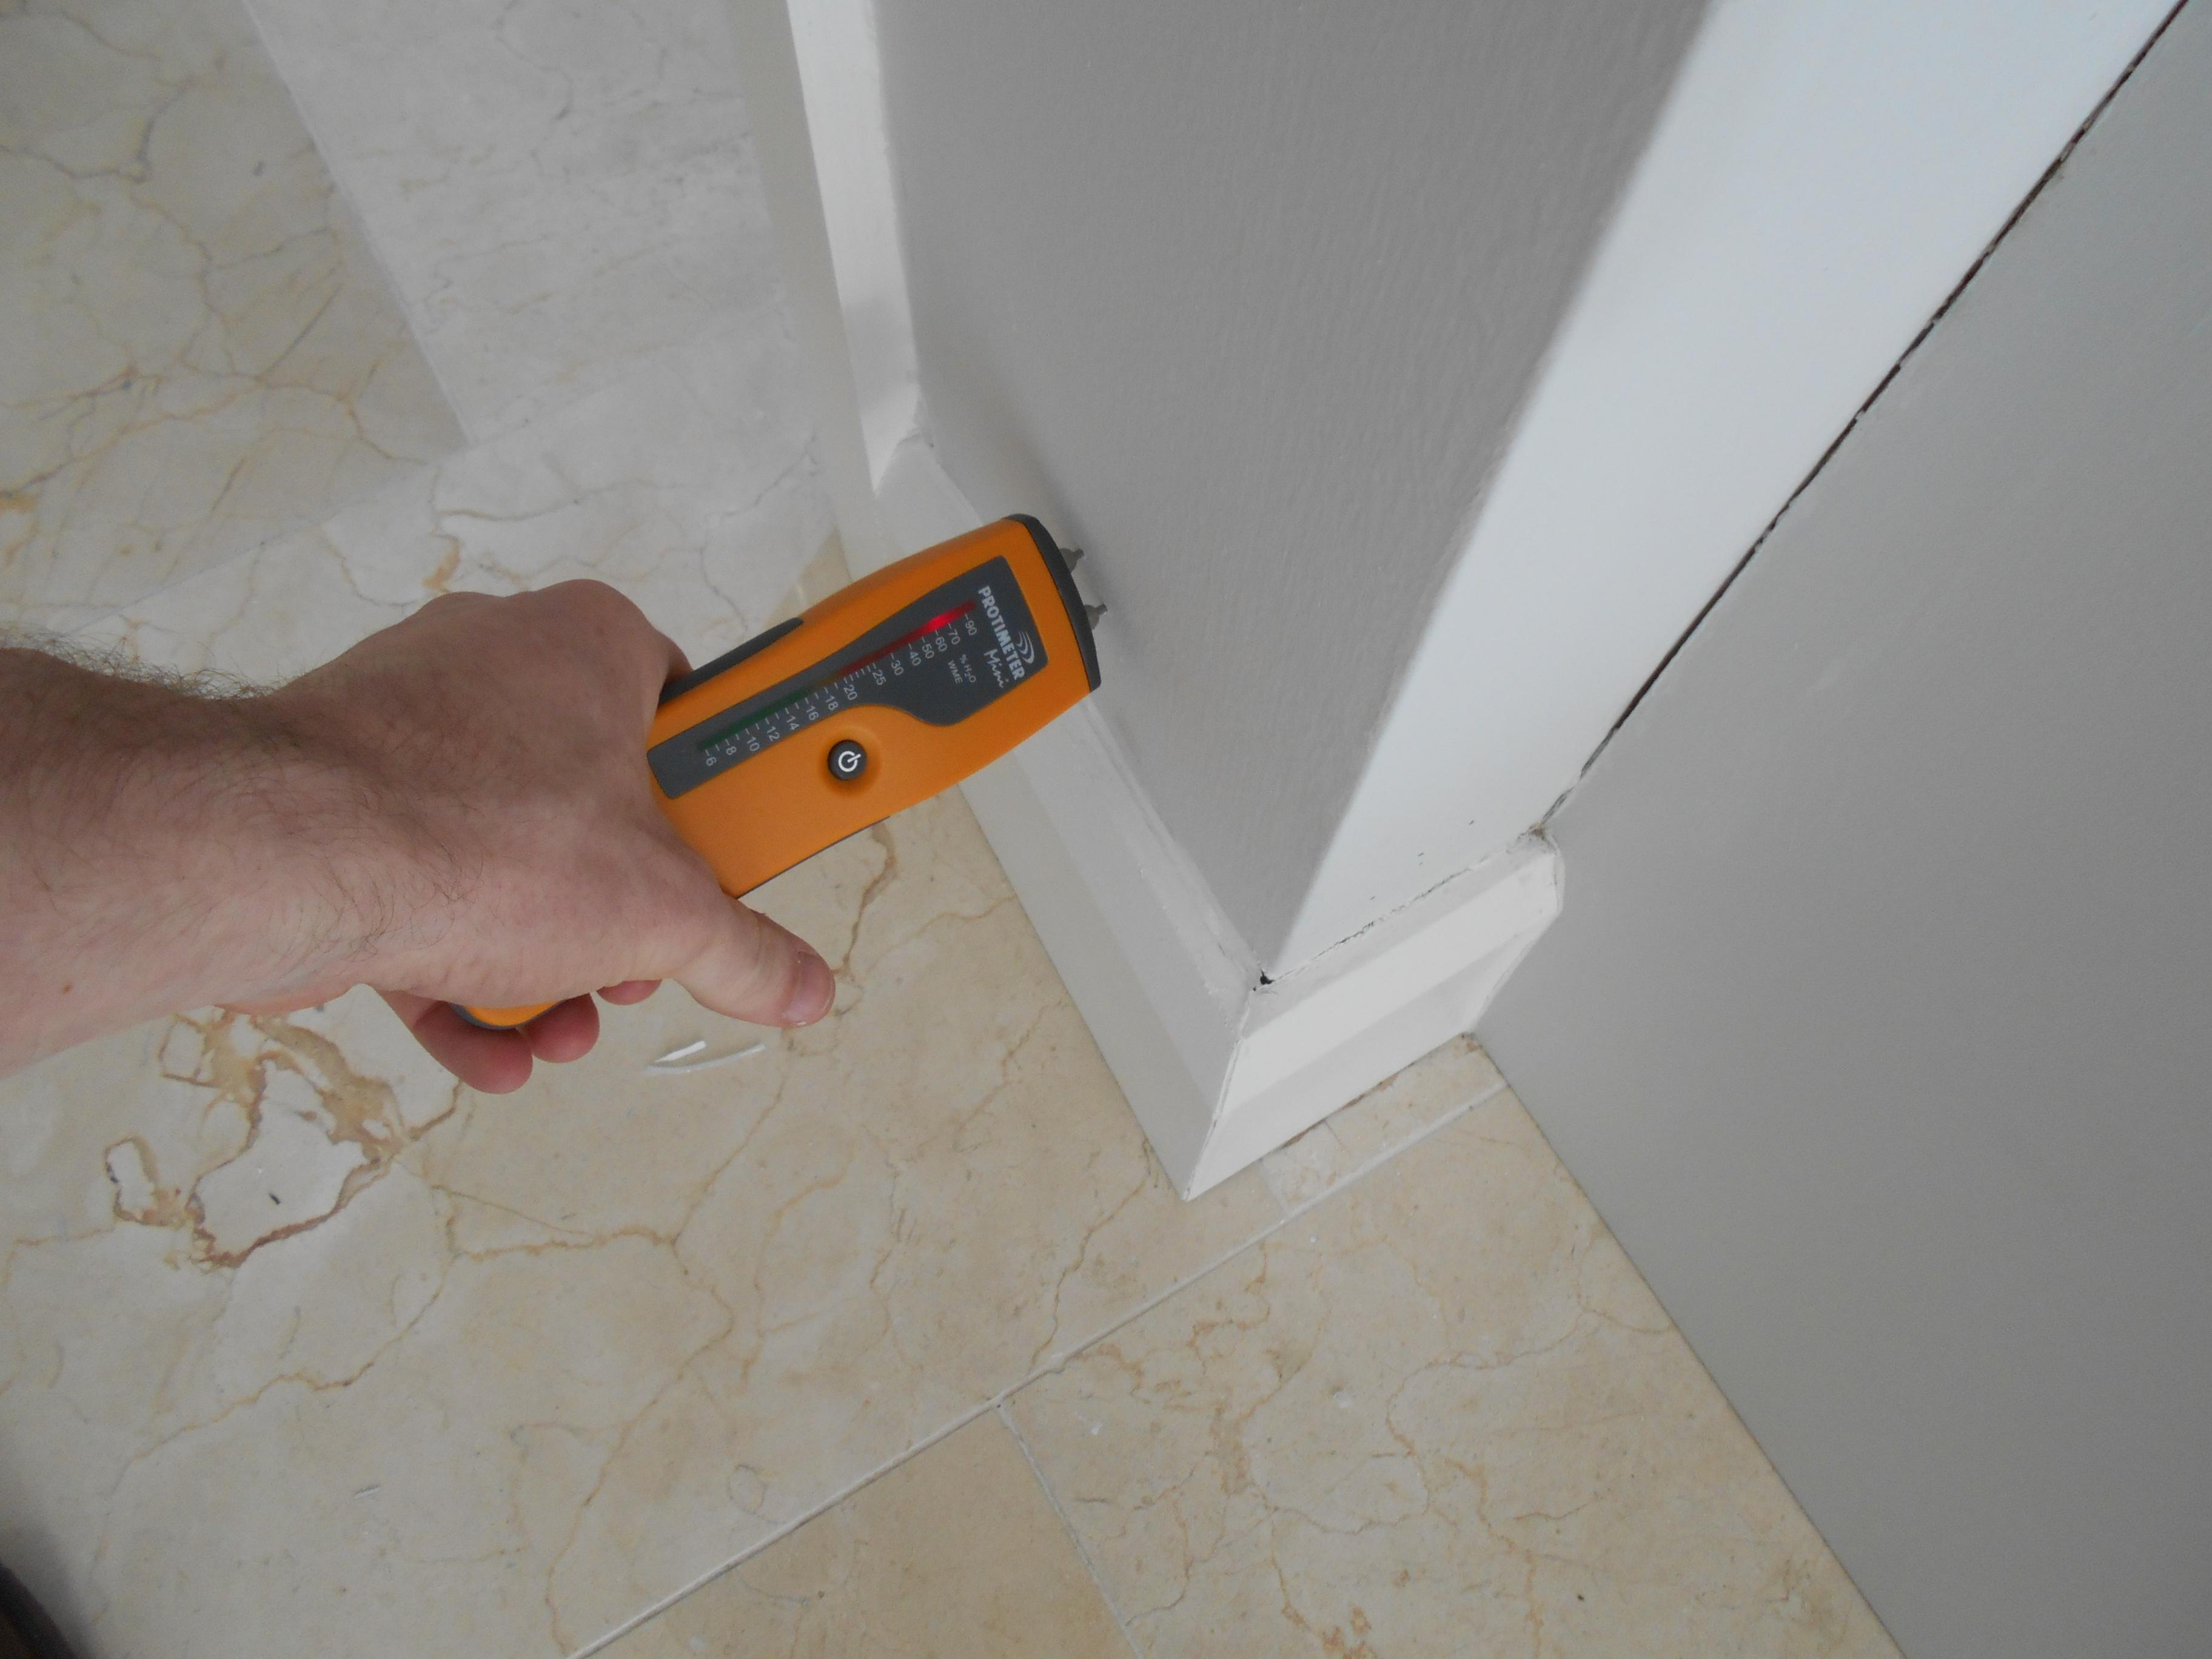 High damp readings recorded on moisteure meter